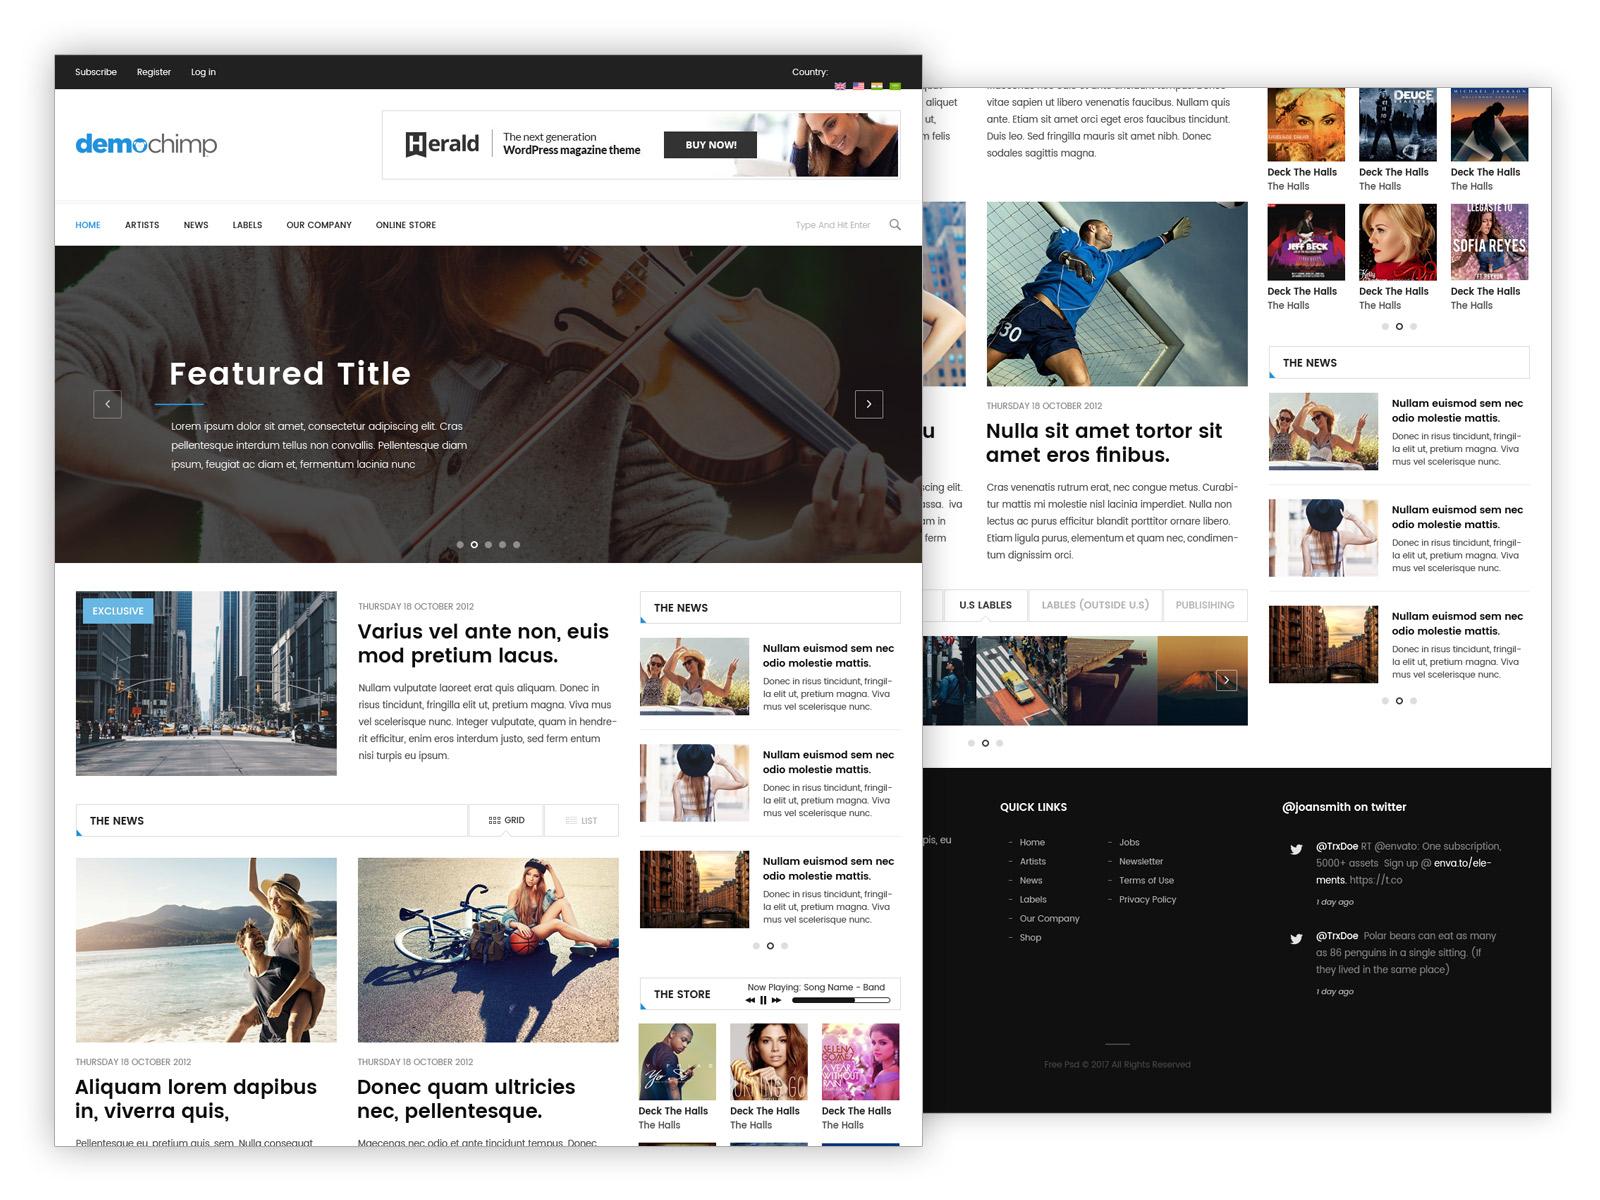 easy social media post design online application